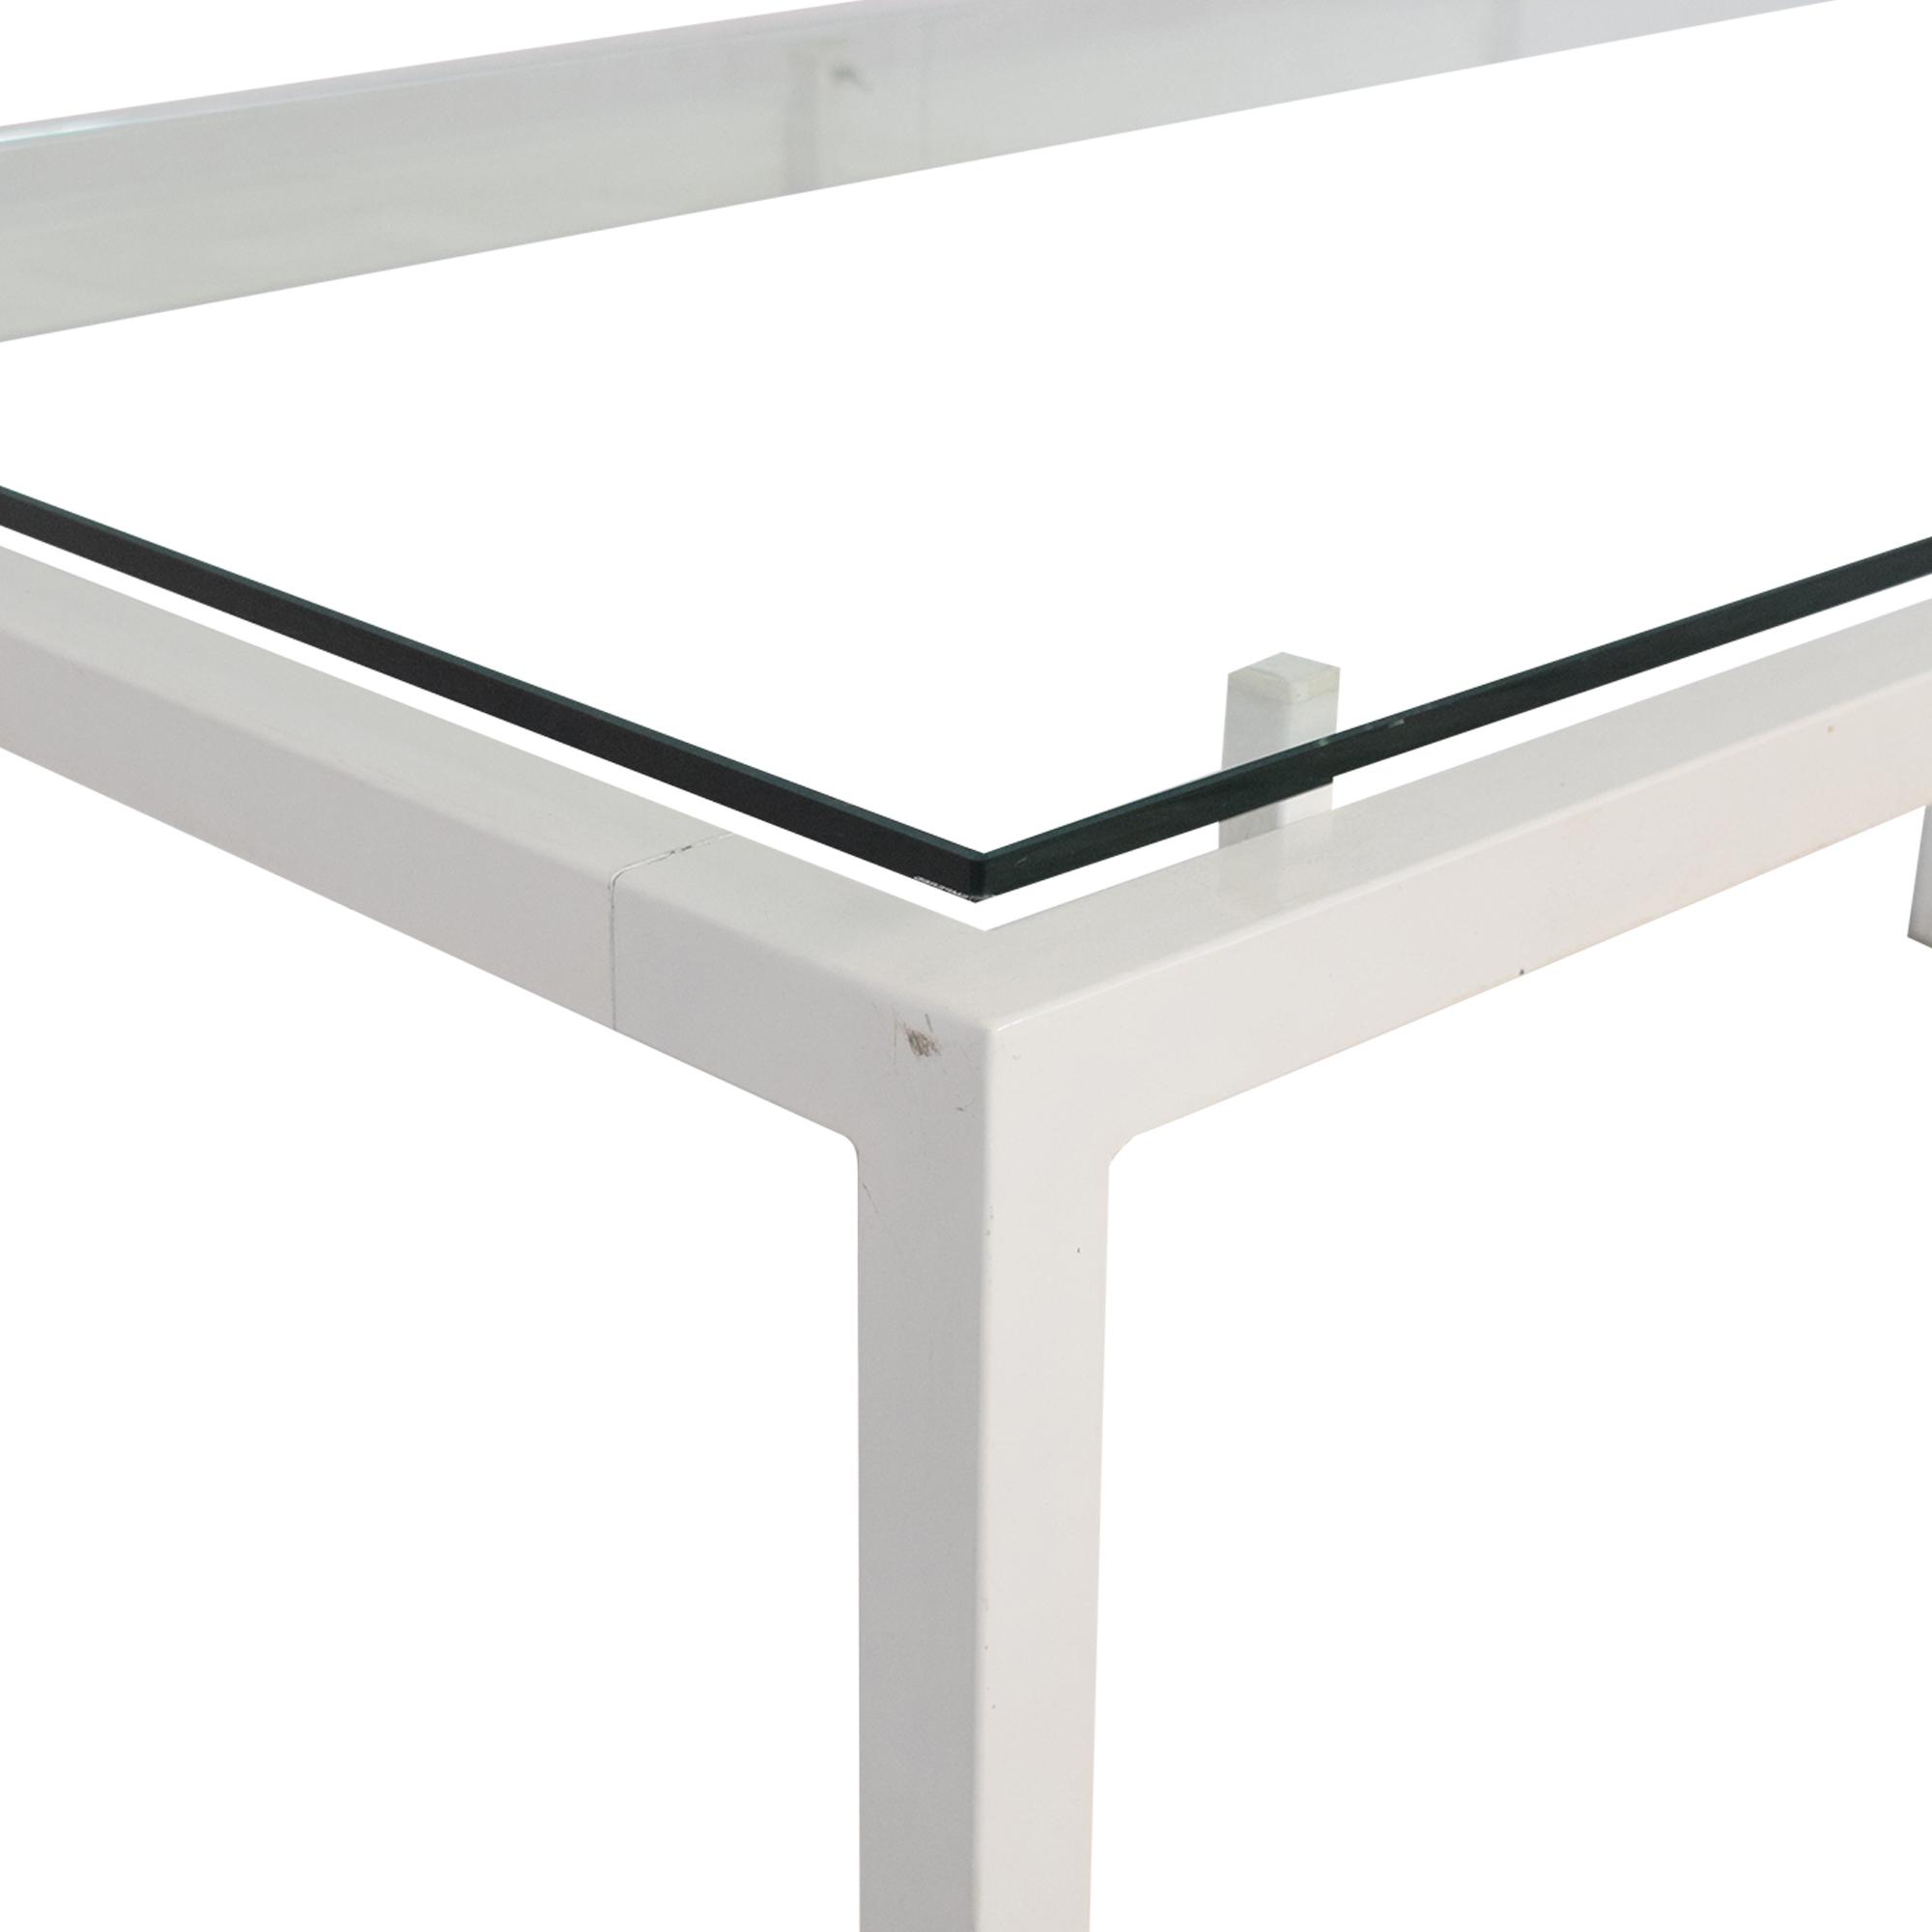 Design Within Reach Design Within Reach Tavola Table